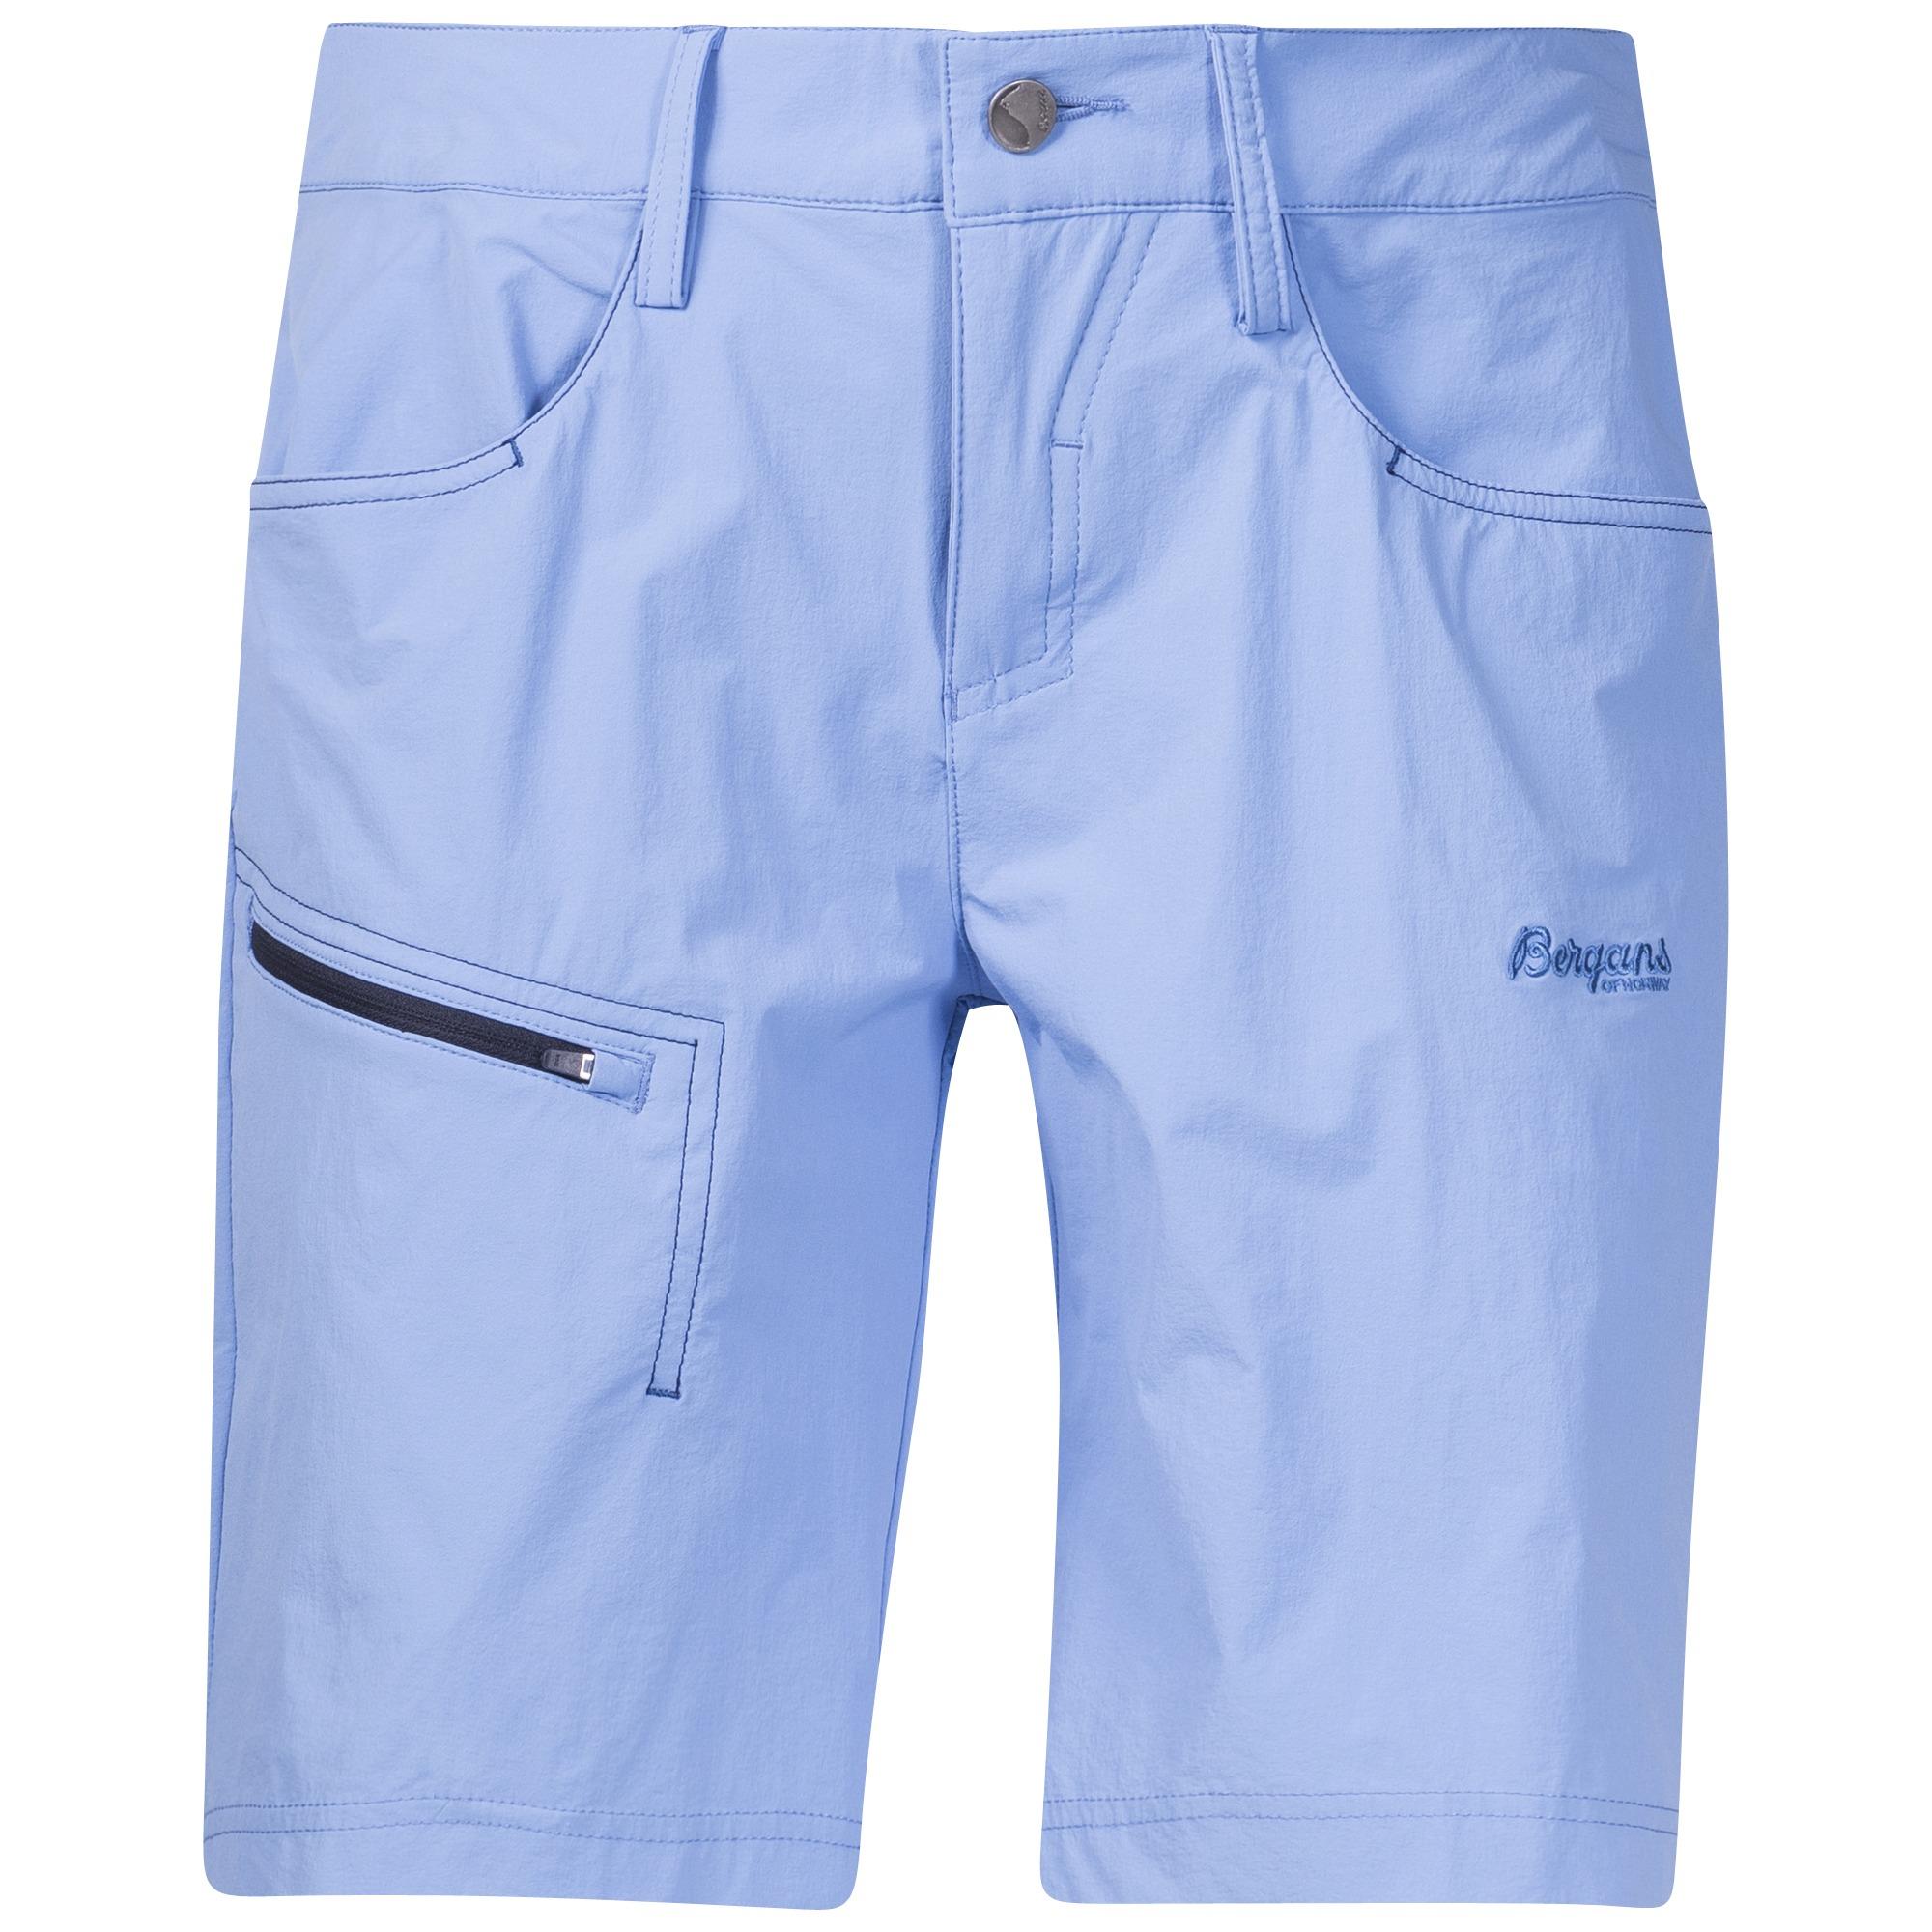 Bergans of Norway Pantaloni scurti Bergans Moa Lady - Bleu